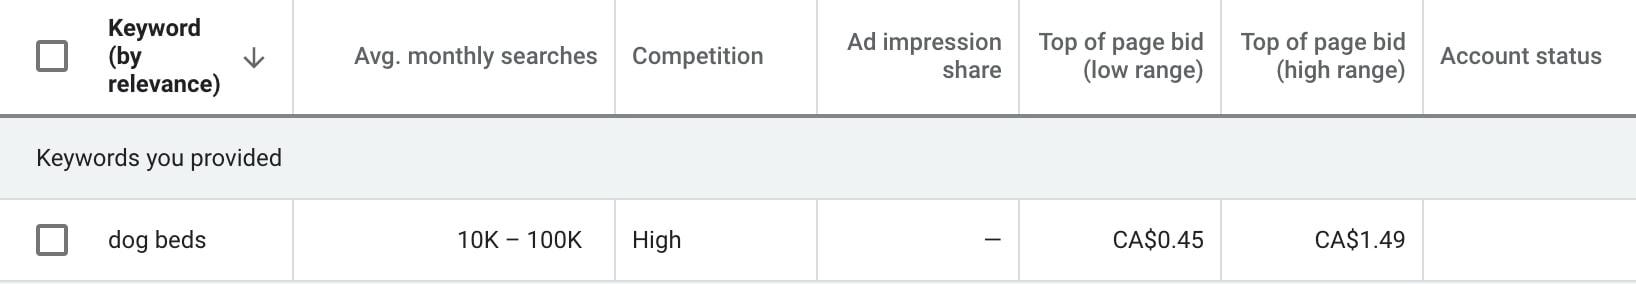 Google Keyword Planner Examples